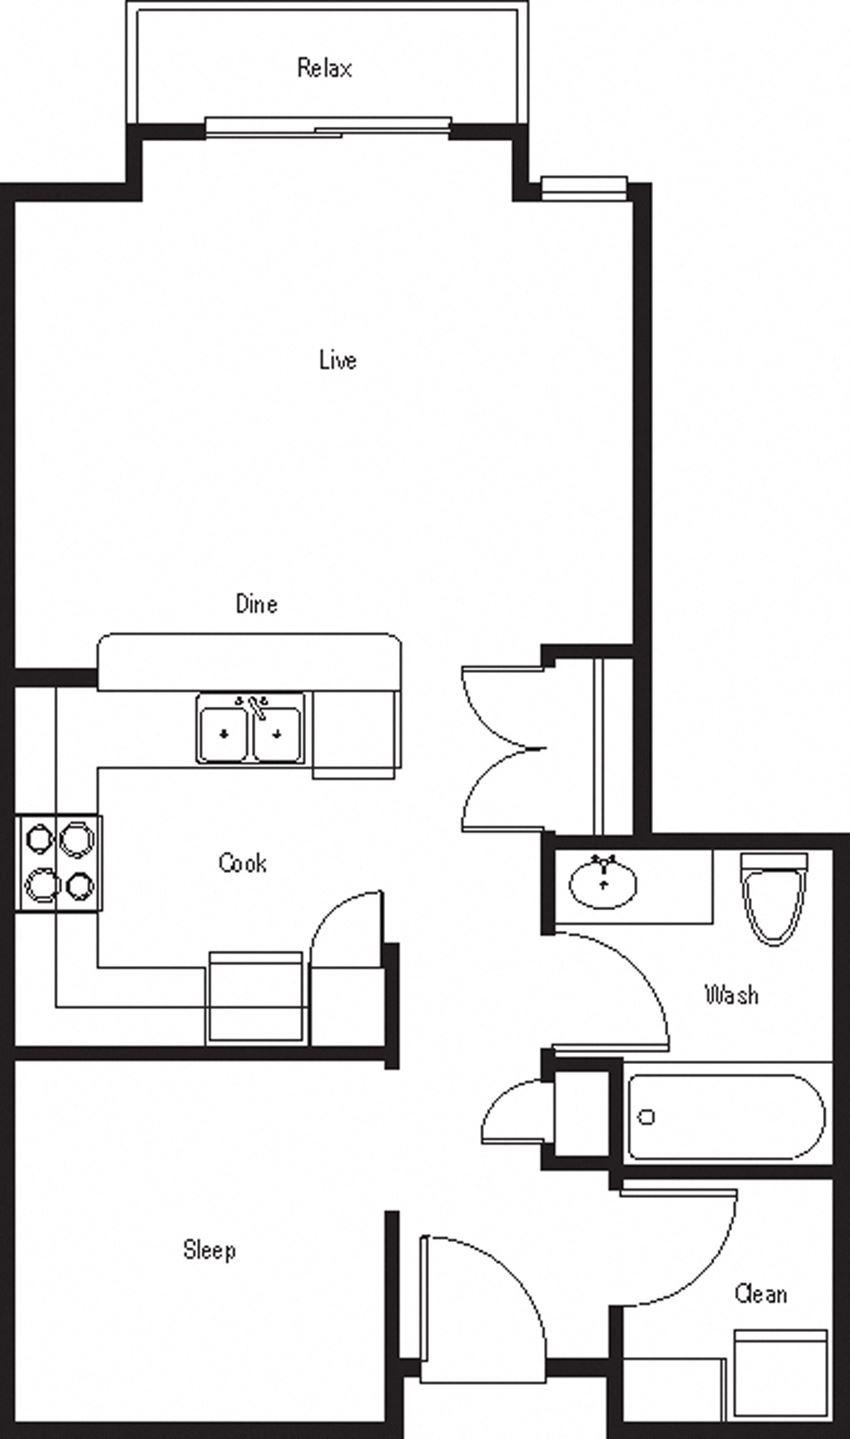 Palmetto – 0 Bedroom 1 Bath Floor Plan Layout – 577 Square Feet